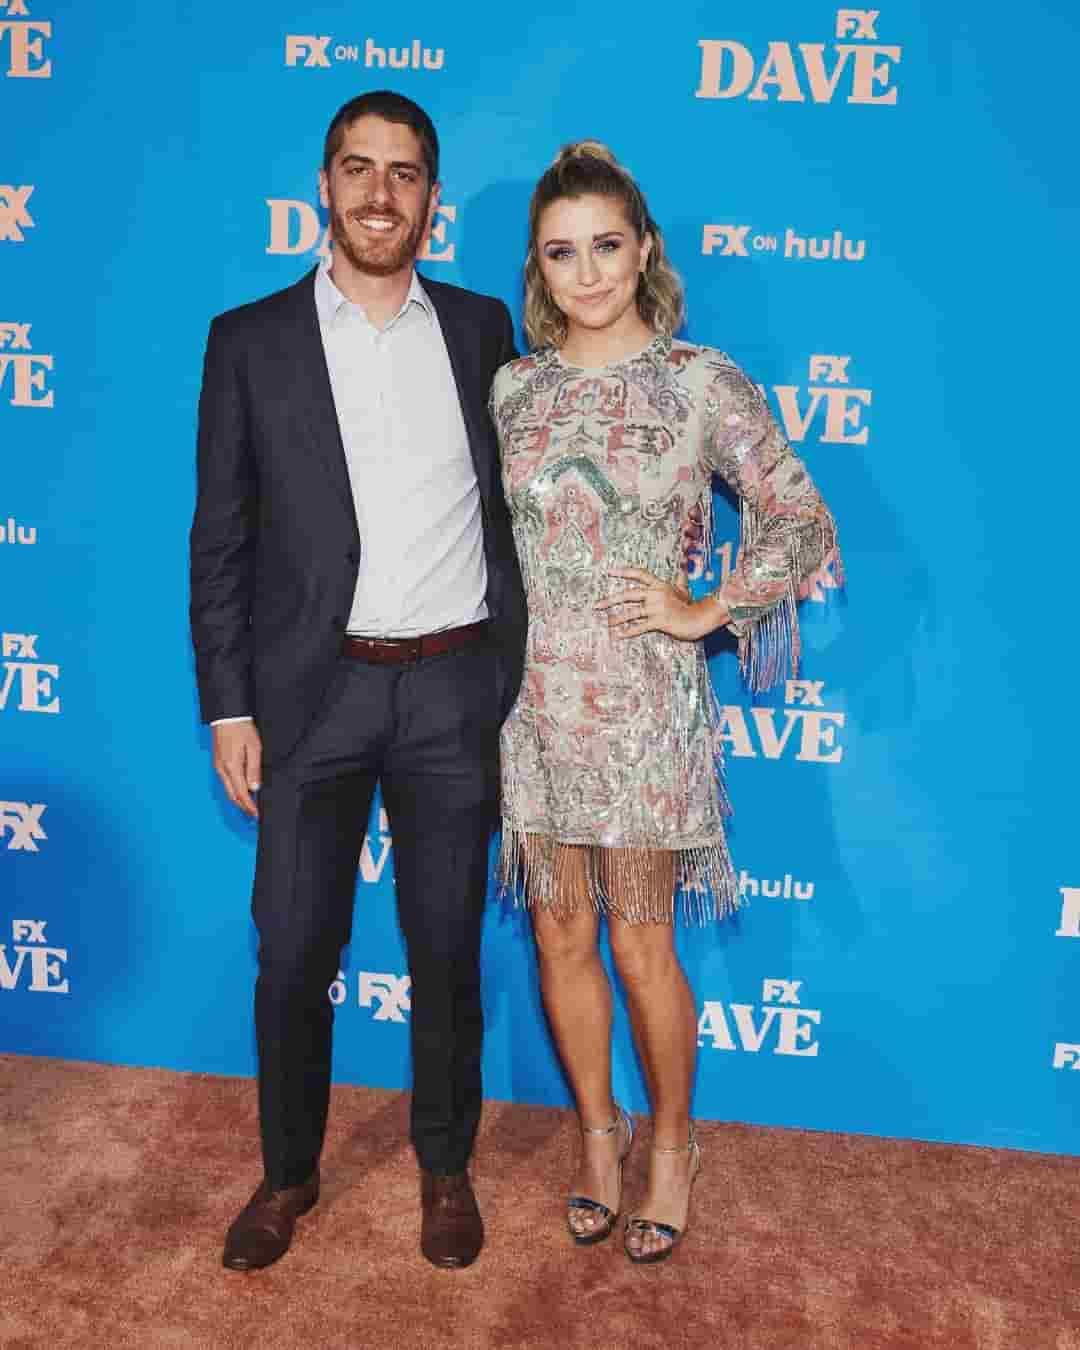 Taylor Misiak with her boyfriend Tony in premier of DAVE.